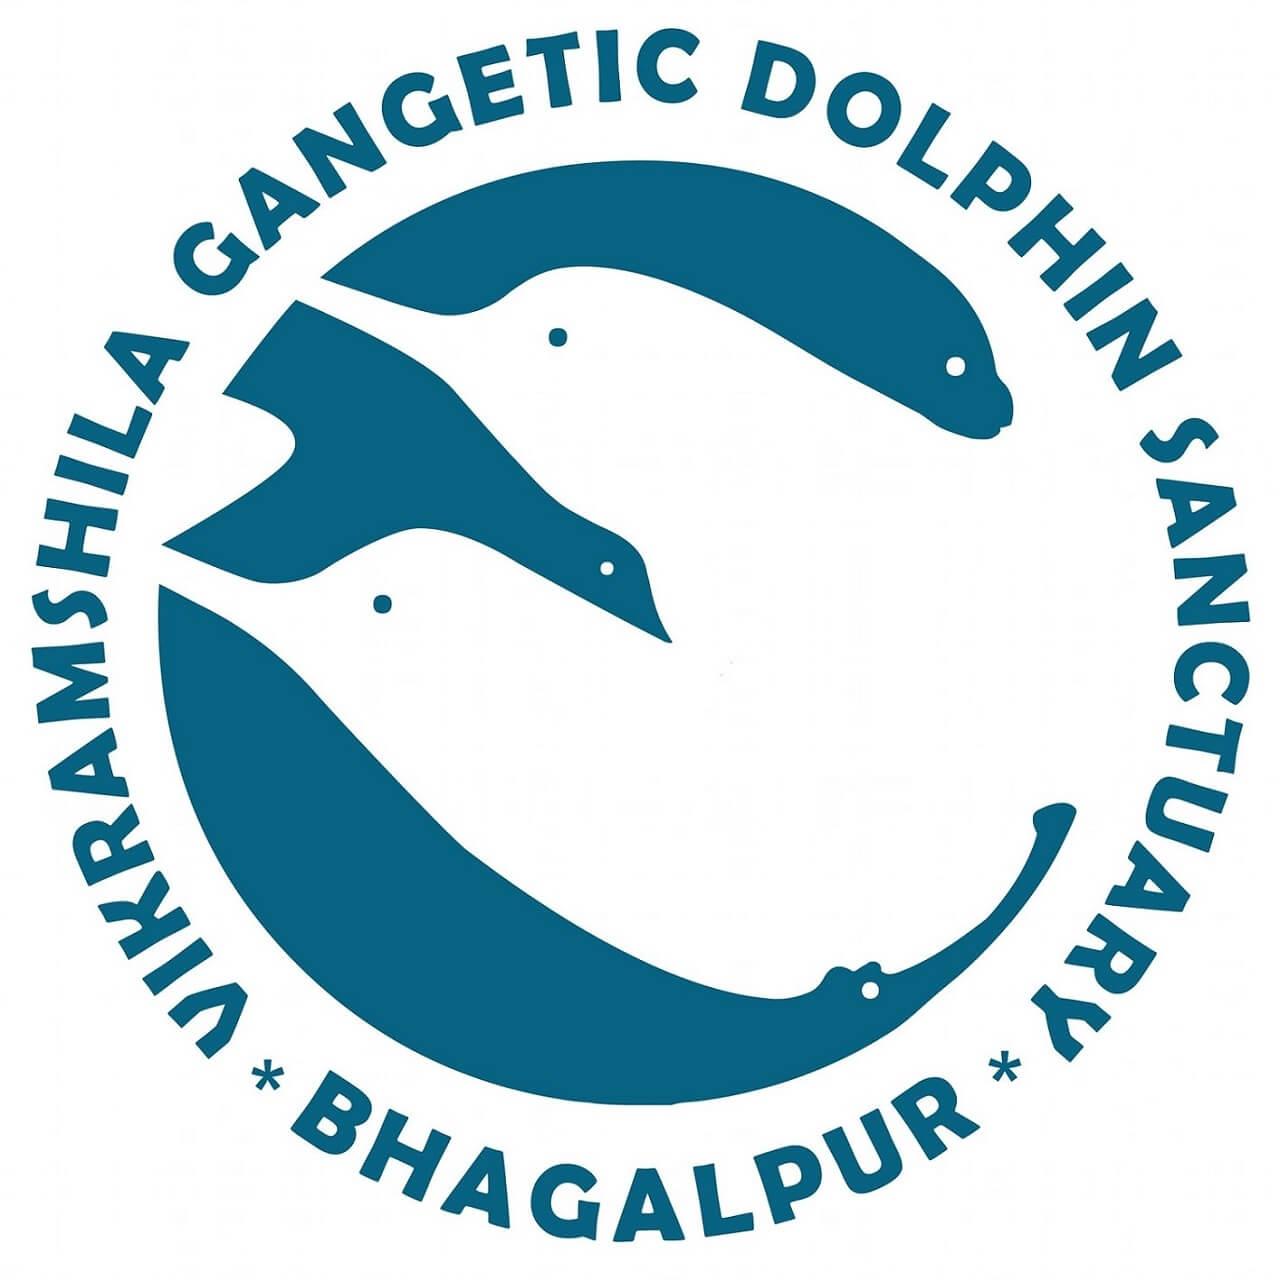 Vikramshila Gangetic Dolphin Sanctuary Bhagalpur logo